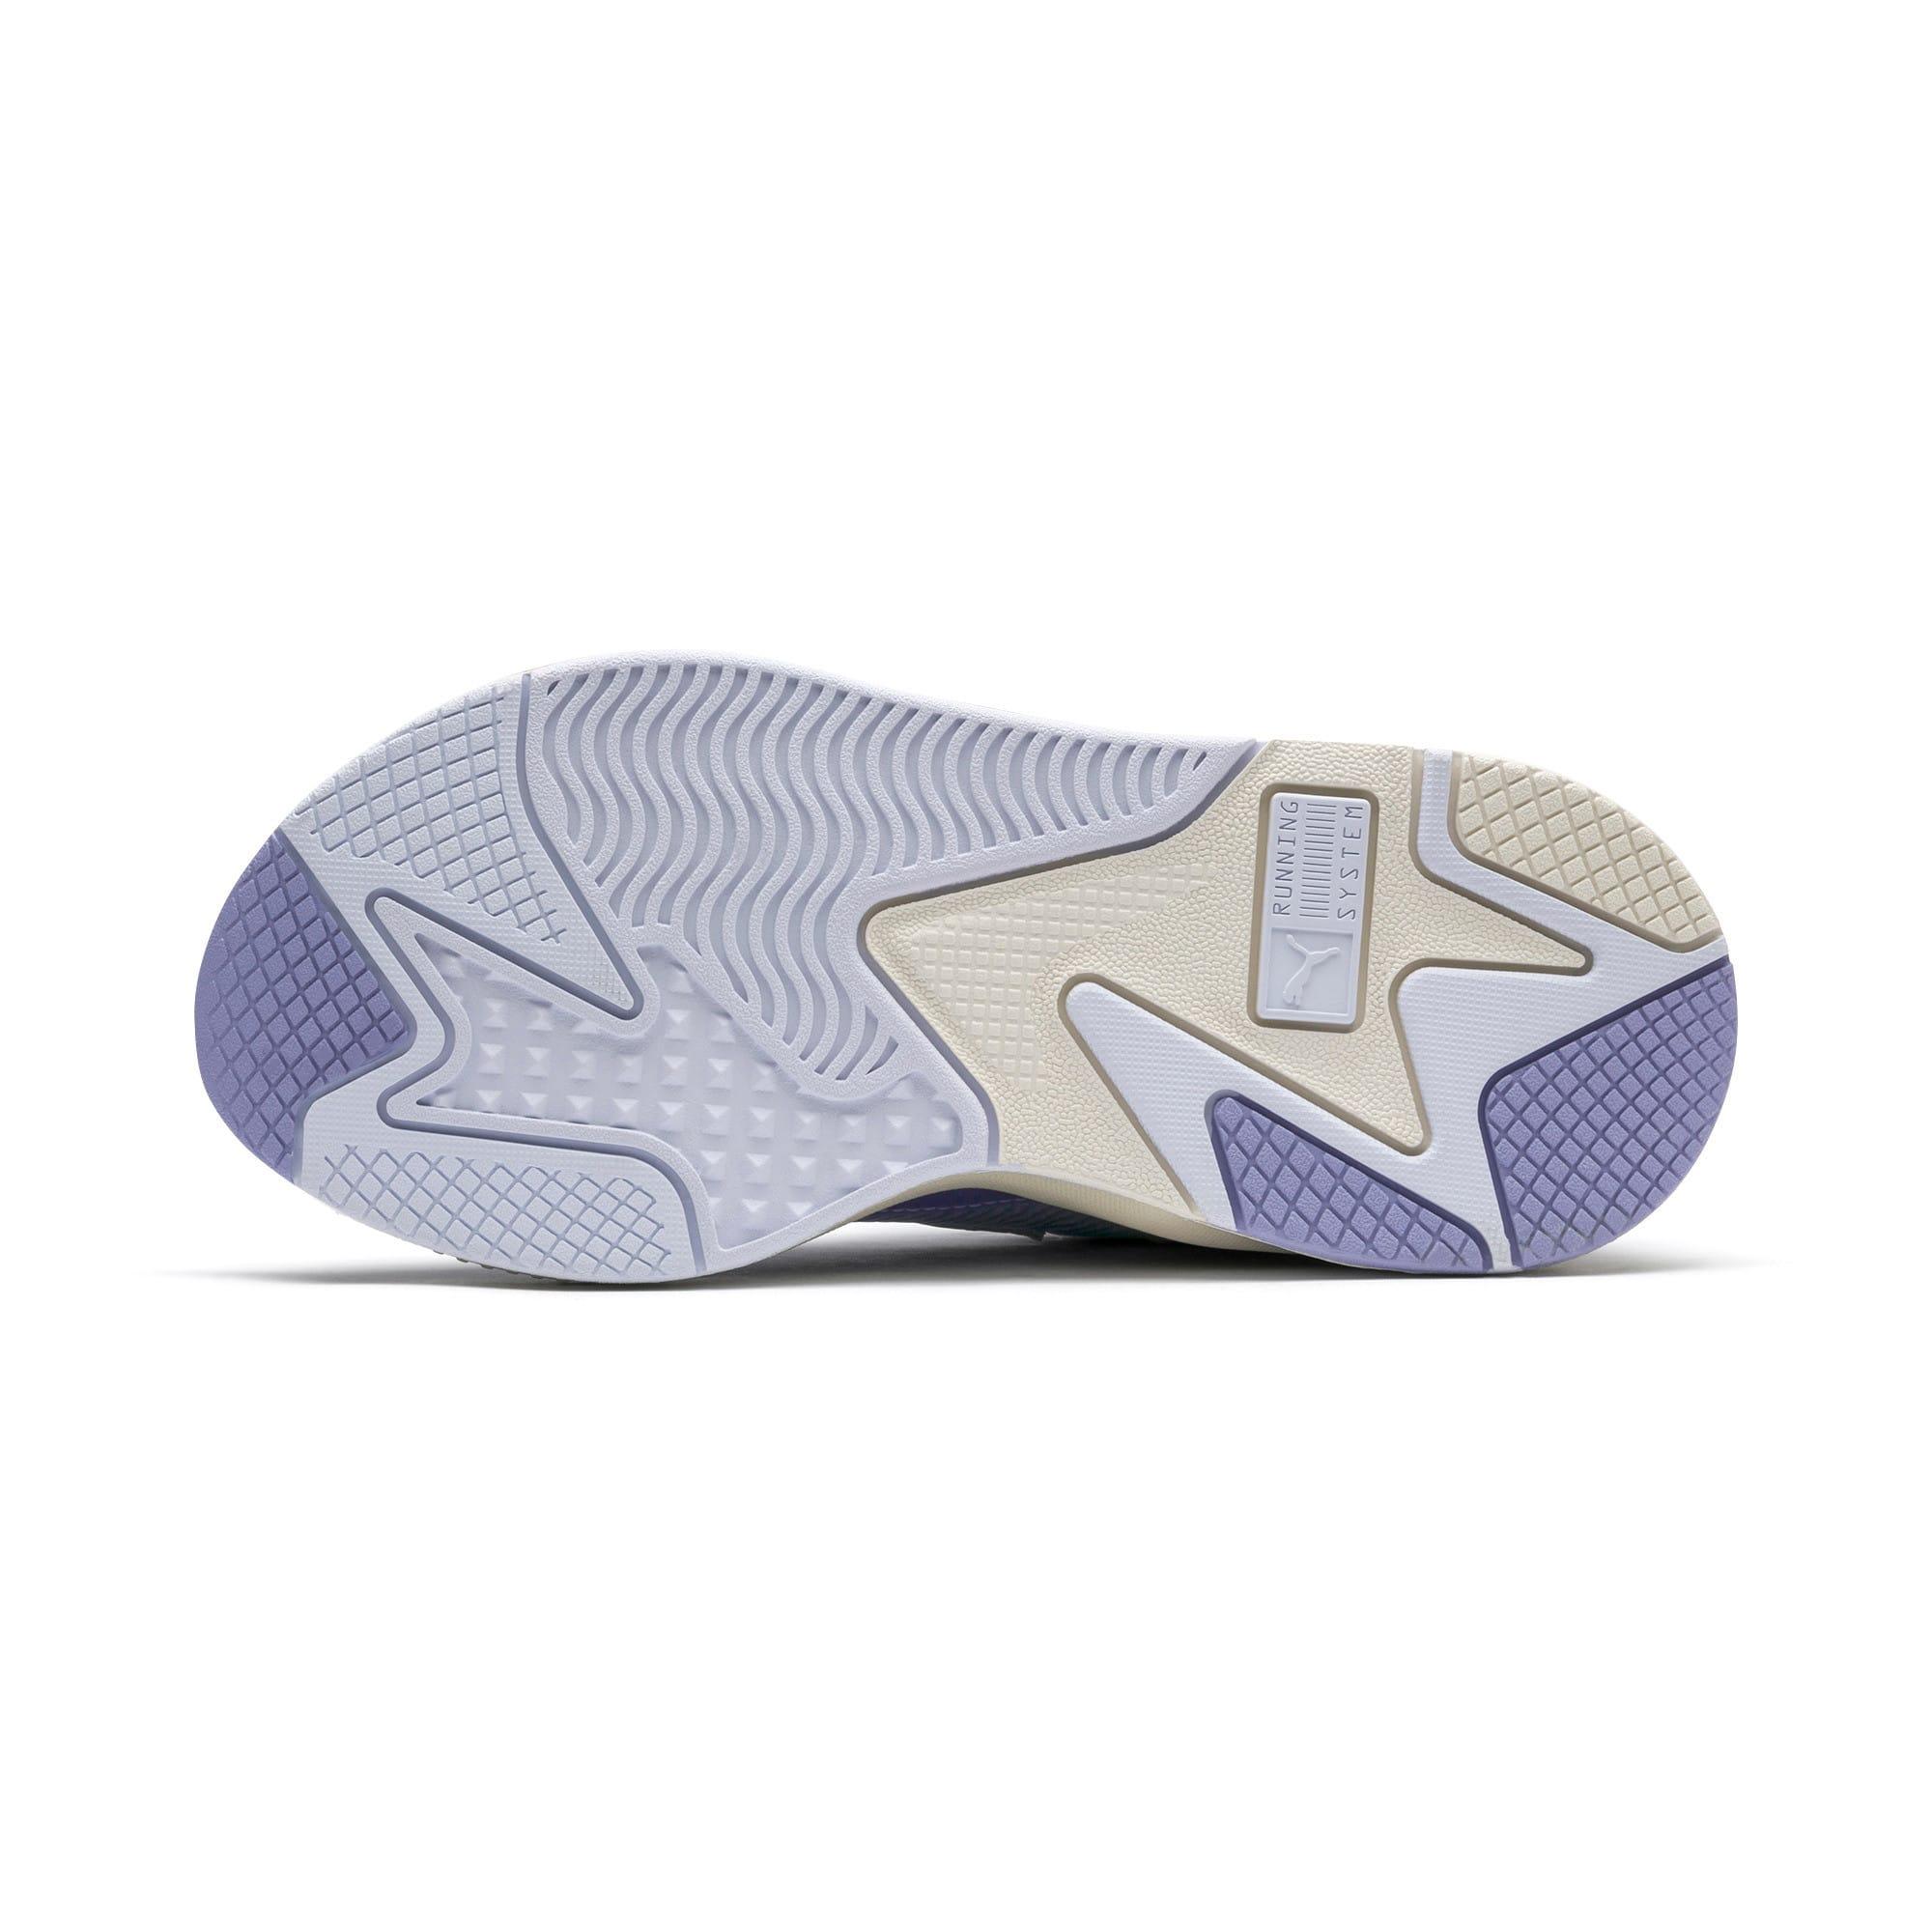 Thumbnail 4 of Basket RS-X Tech, Puma White-Sweet Lavender, medium